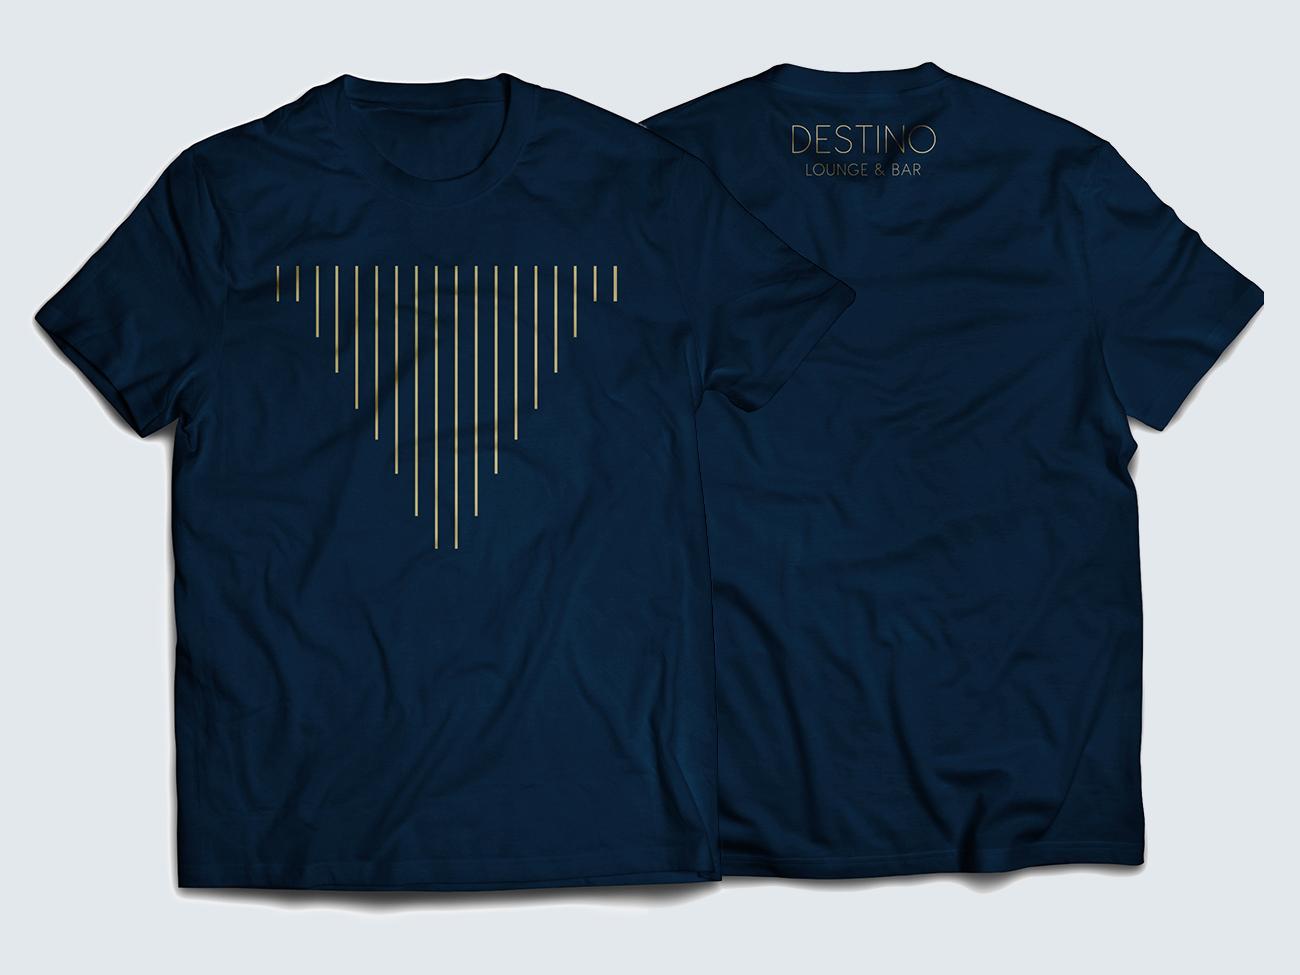 Destino-T-Shirt-MockUp